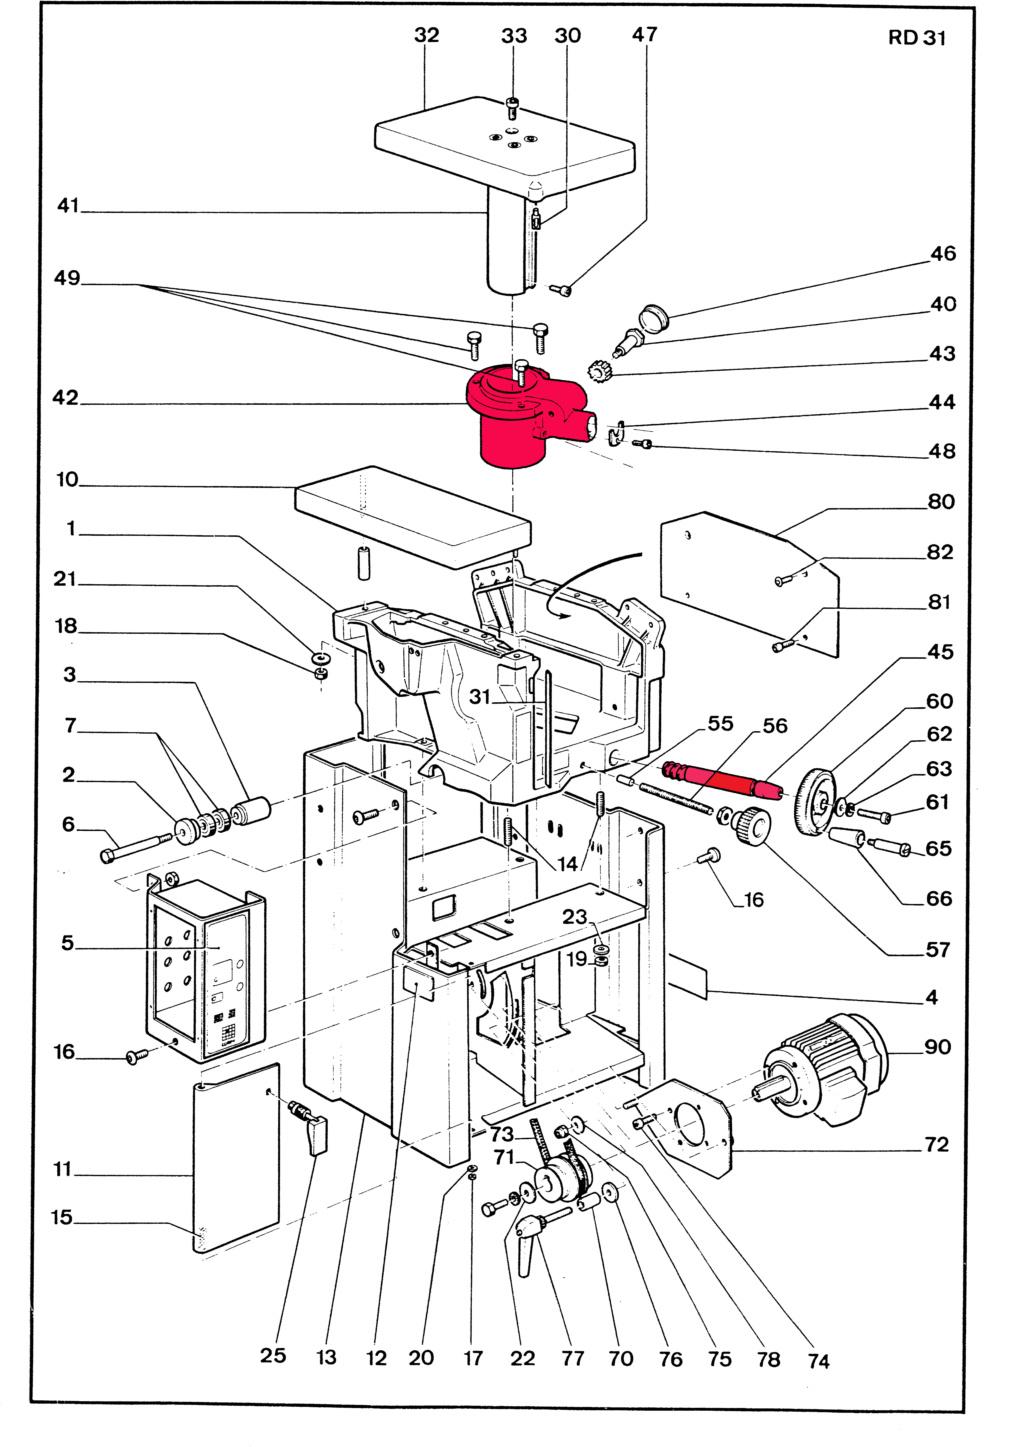 motorisation table dégau rabot Lurem RD310 Eclatz15